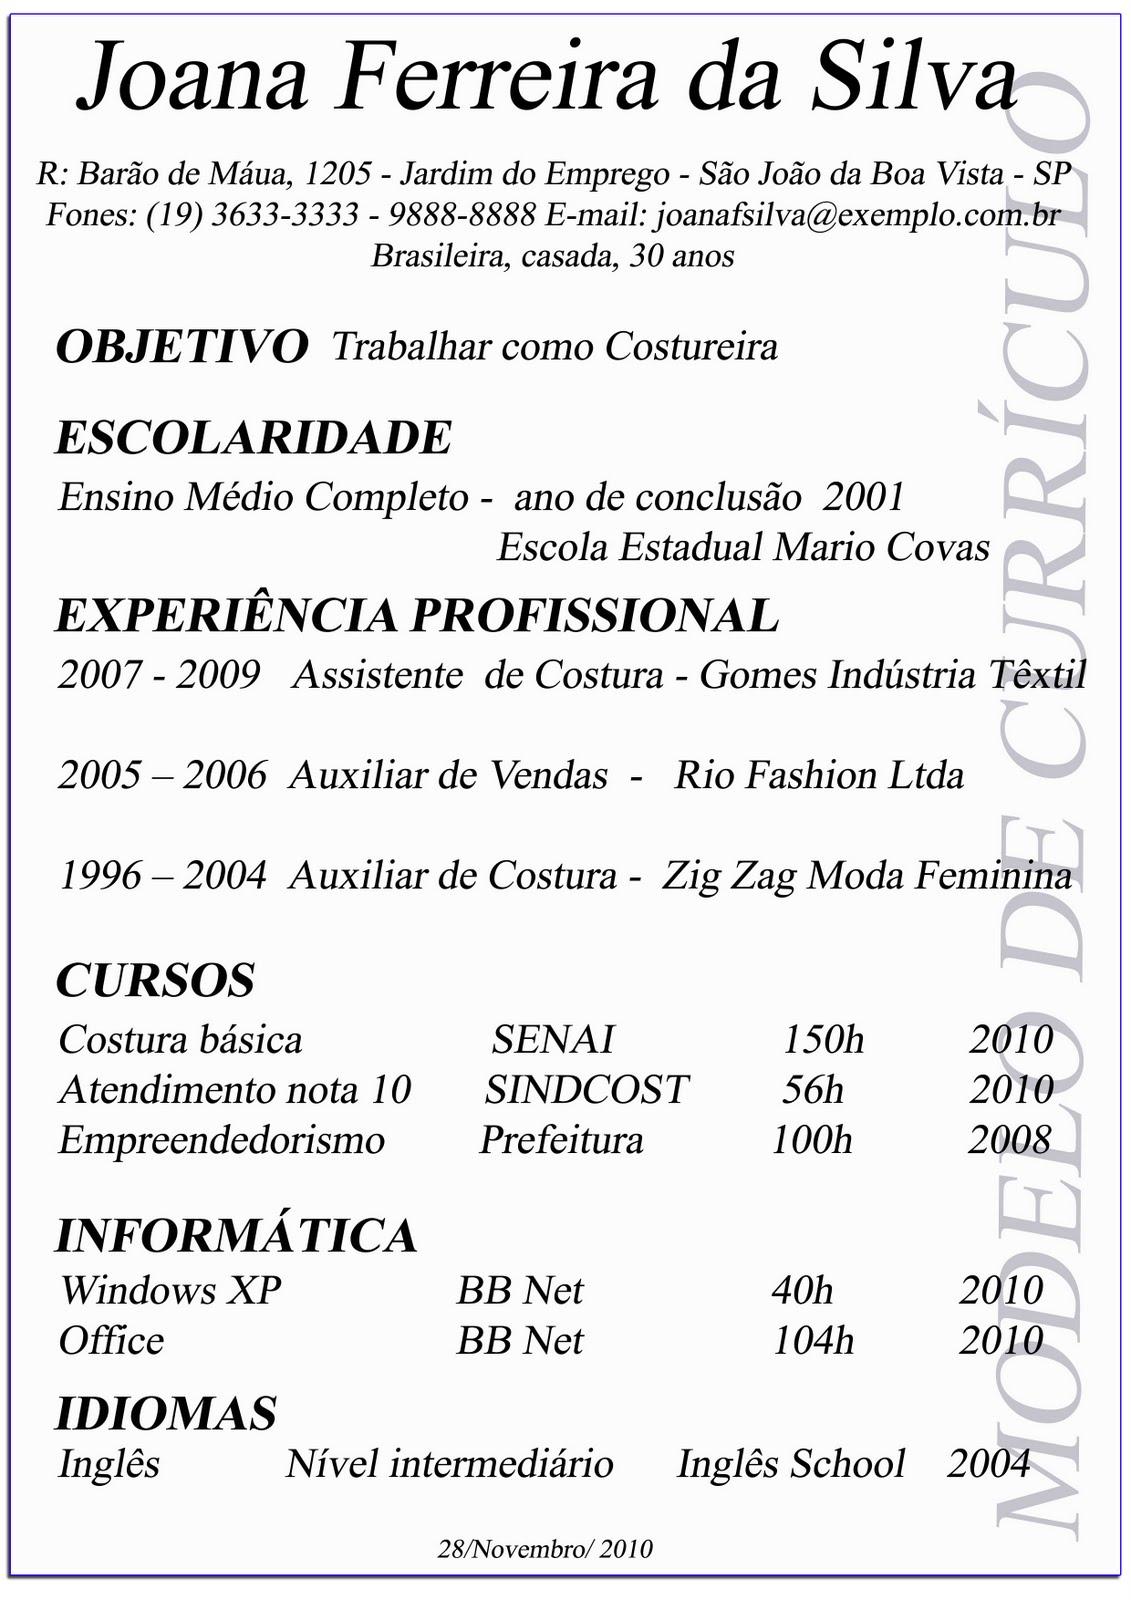 Professor Alexandre Custodio: Currículum Vitae